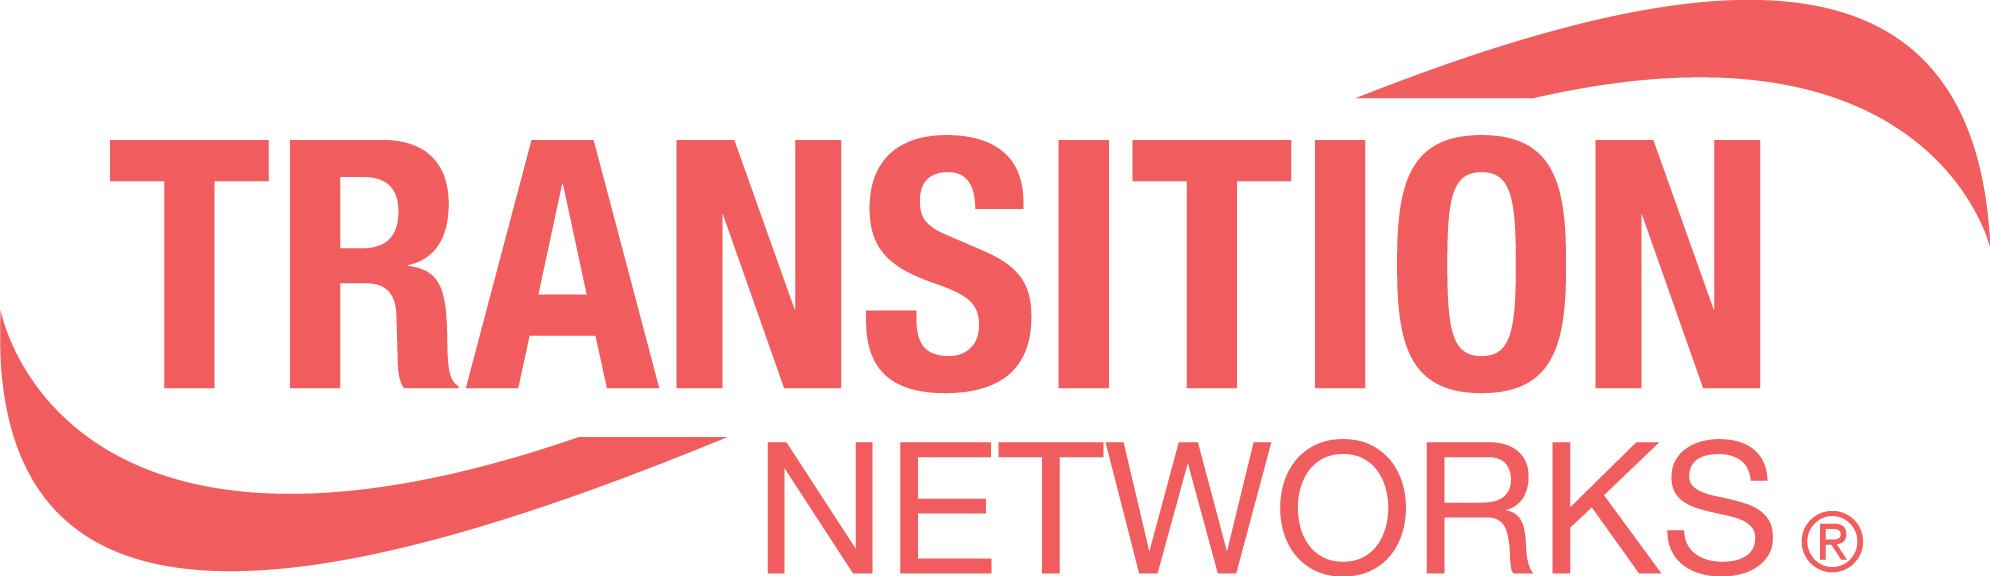 SFP (mini-GBIC) transceiver module - 100Mb LAN SONET/SDH - 100Base-LX CWDM - LC single-mode - up to 49.7 miles - OC-3/STM-1 - 1390 nm